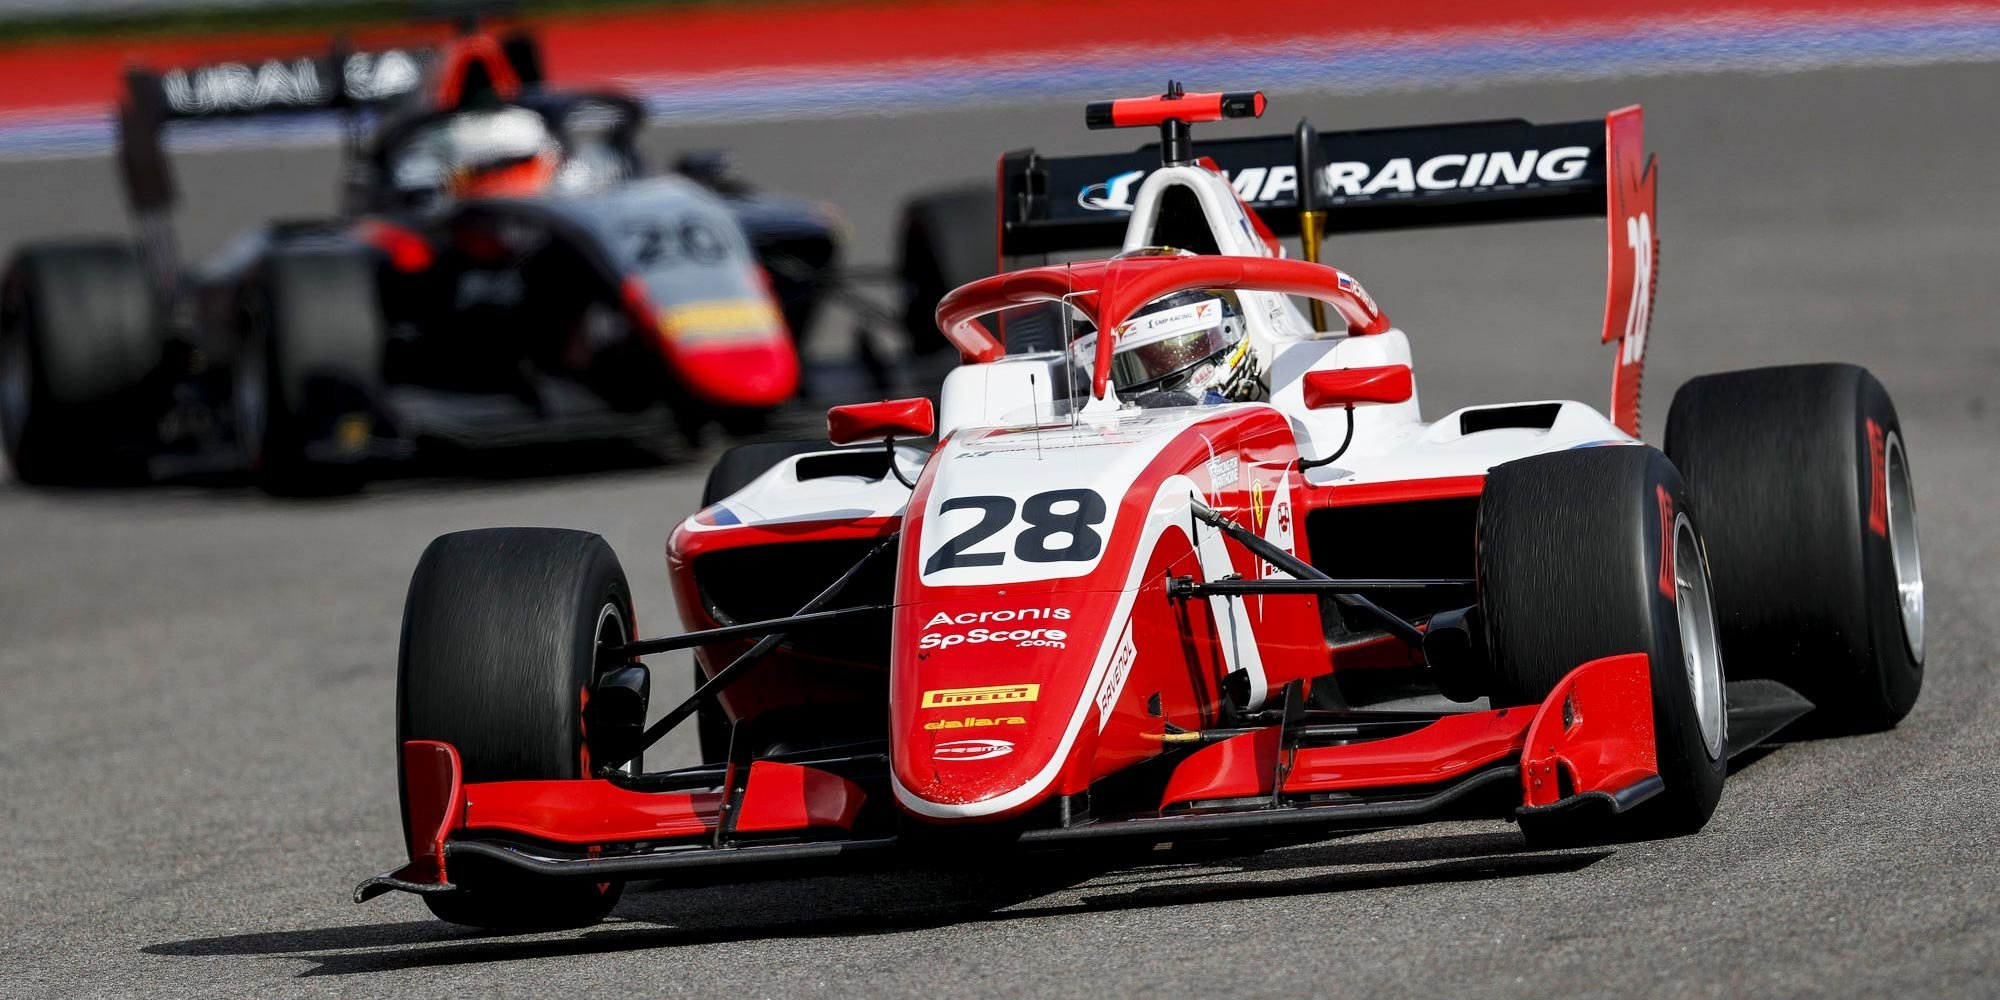 Лоусон выиграл вторую гонку «Формулы-2» в Монако, Шварцман — 11-й